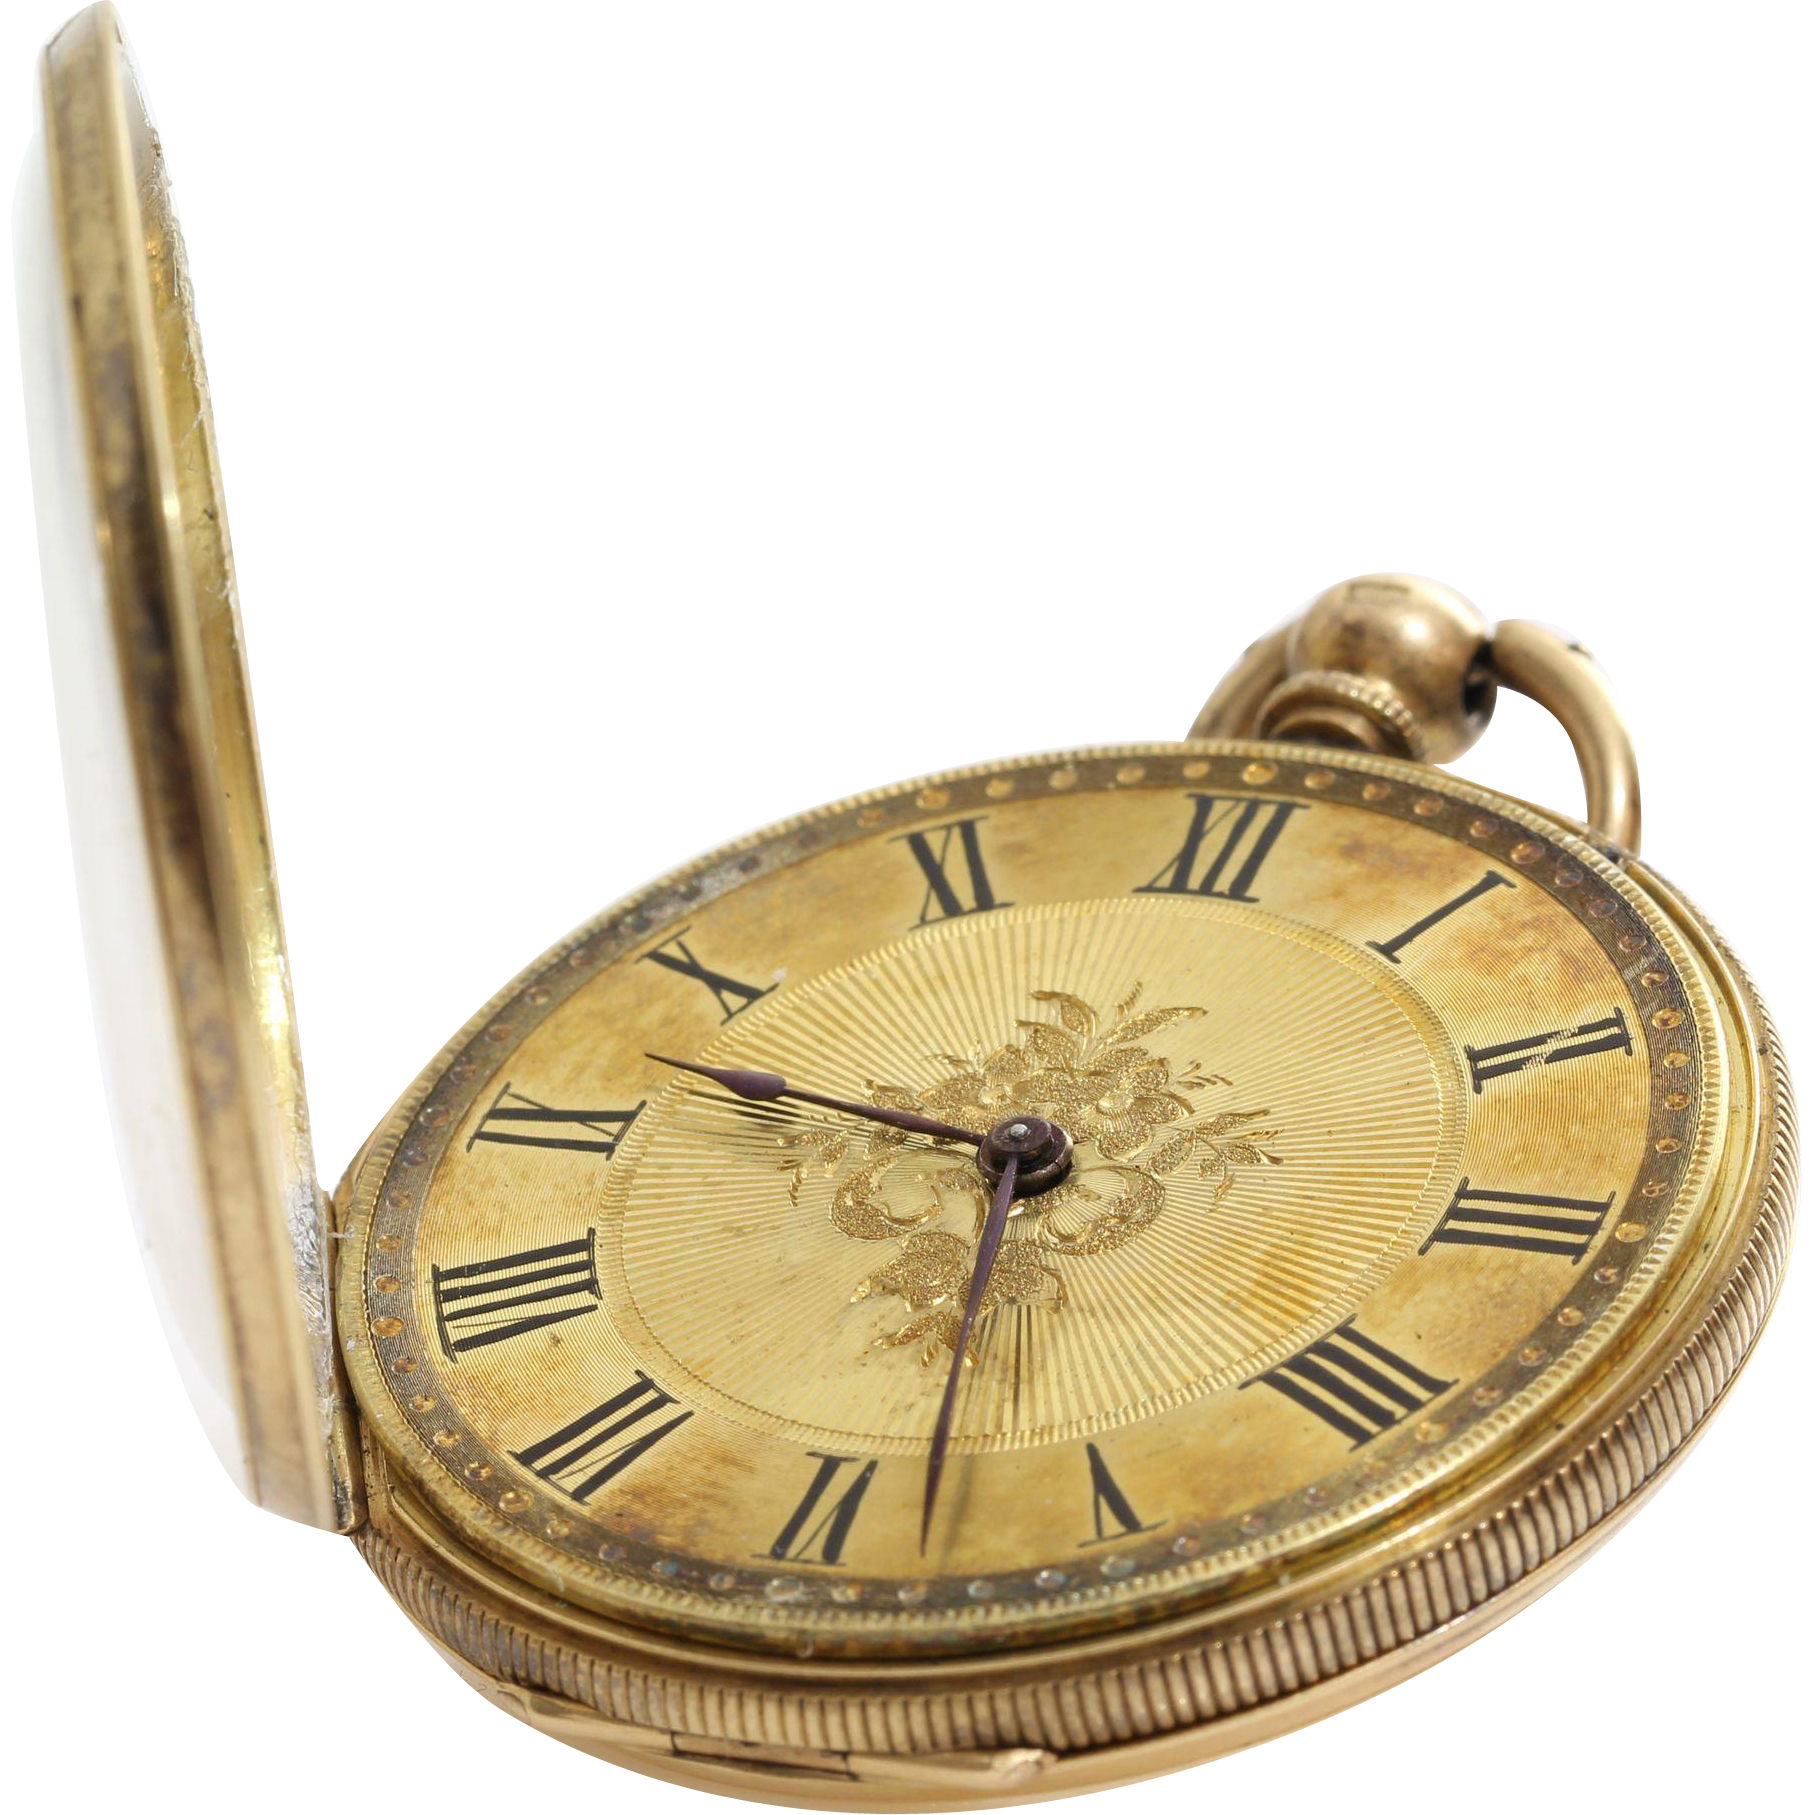 Antique gold pocket watch 18k open face key wind roman numerals open face pocket watch for Vintage gold watch